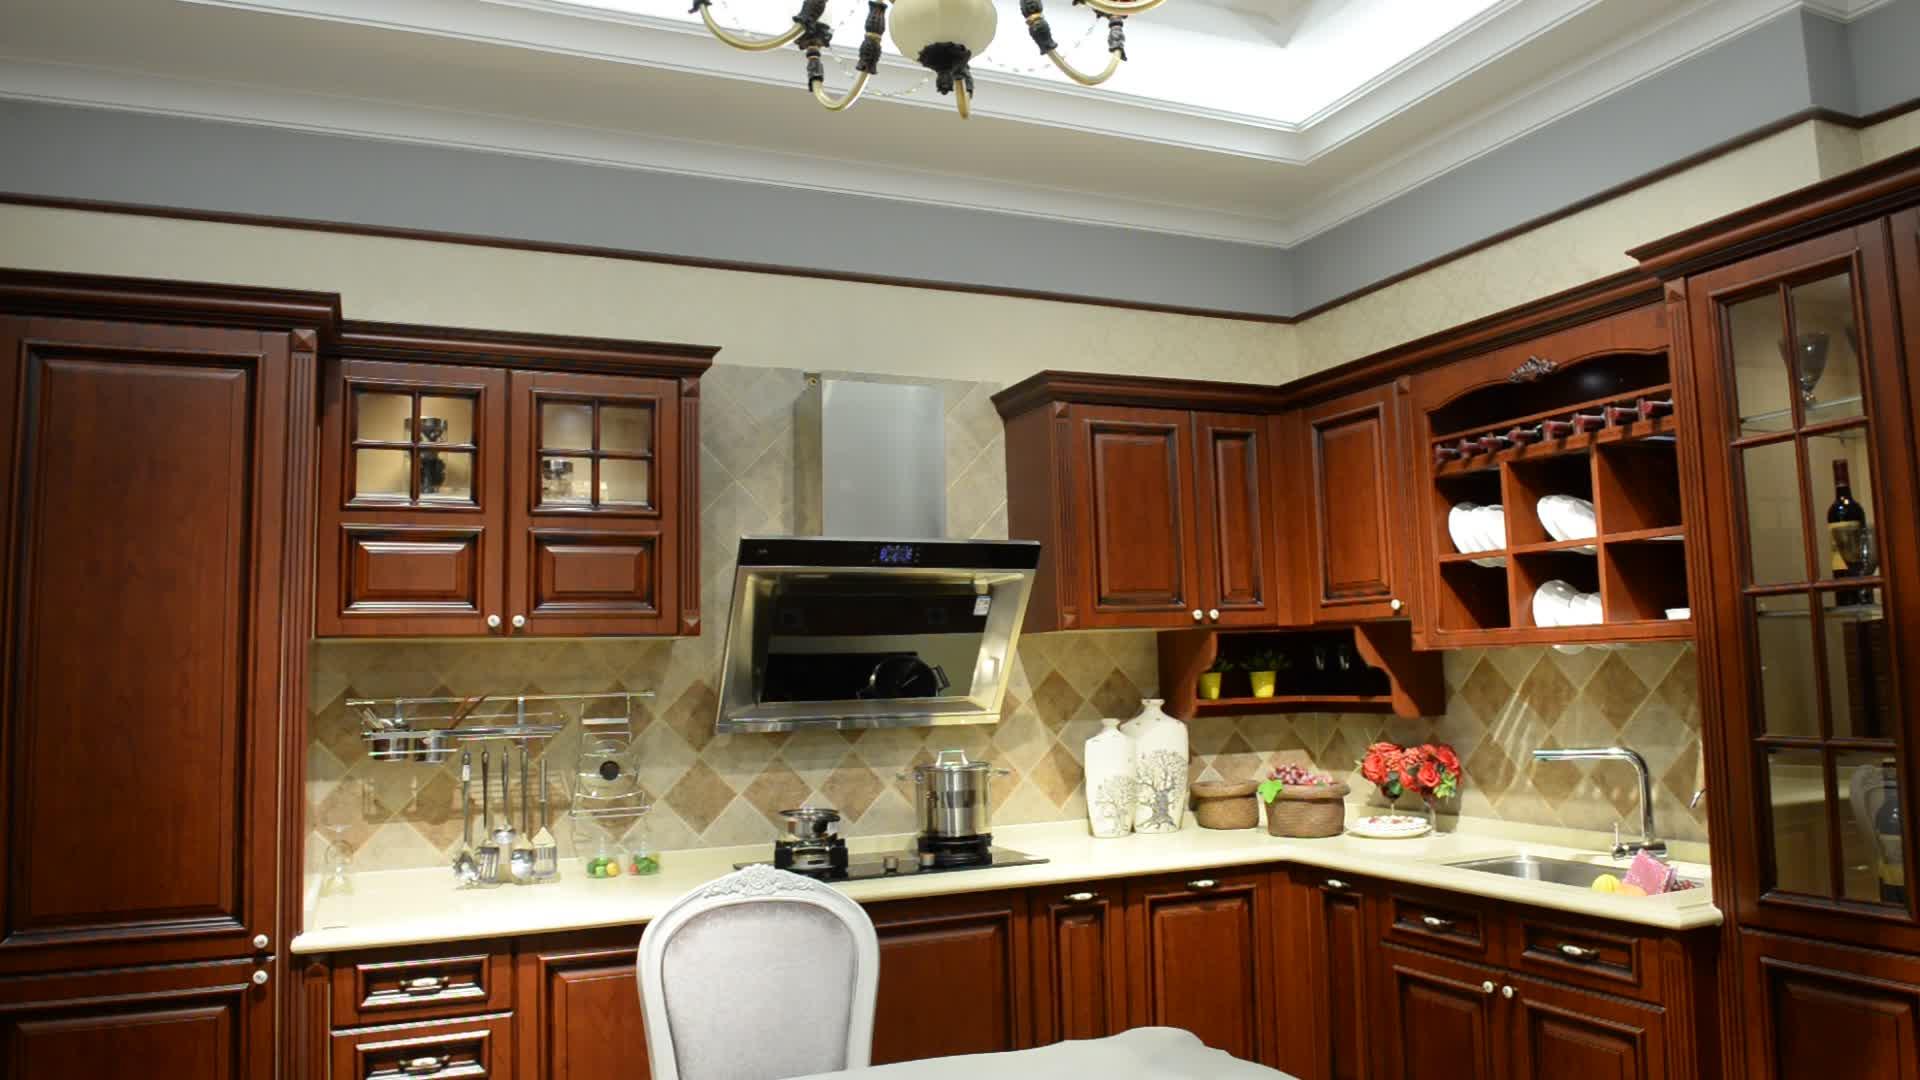 American Kitchen Wall Hanging Solid Wood Complete Veneer ...